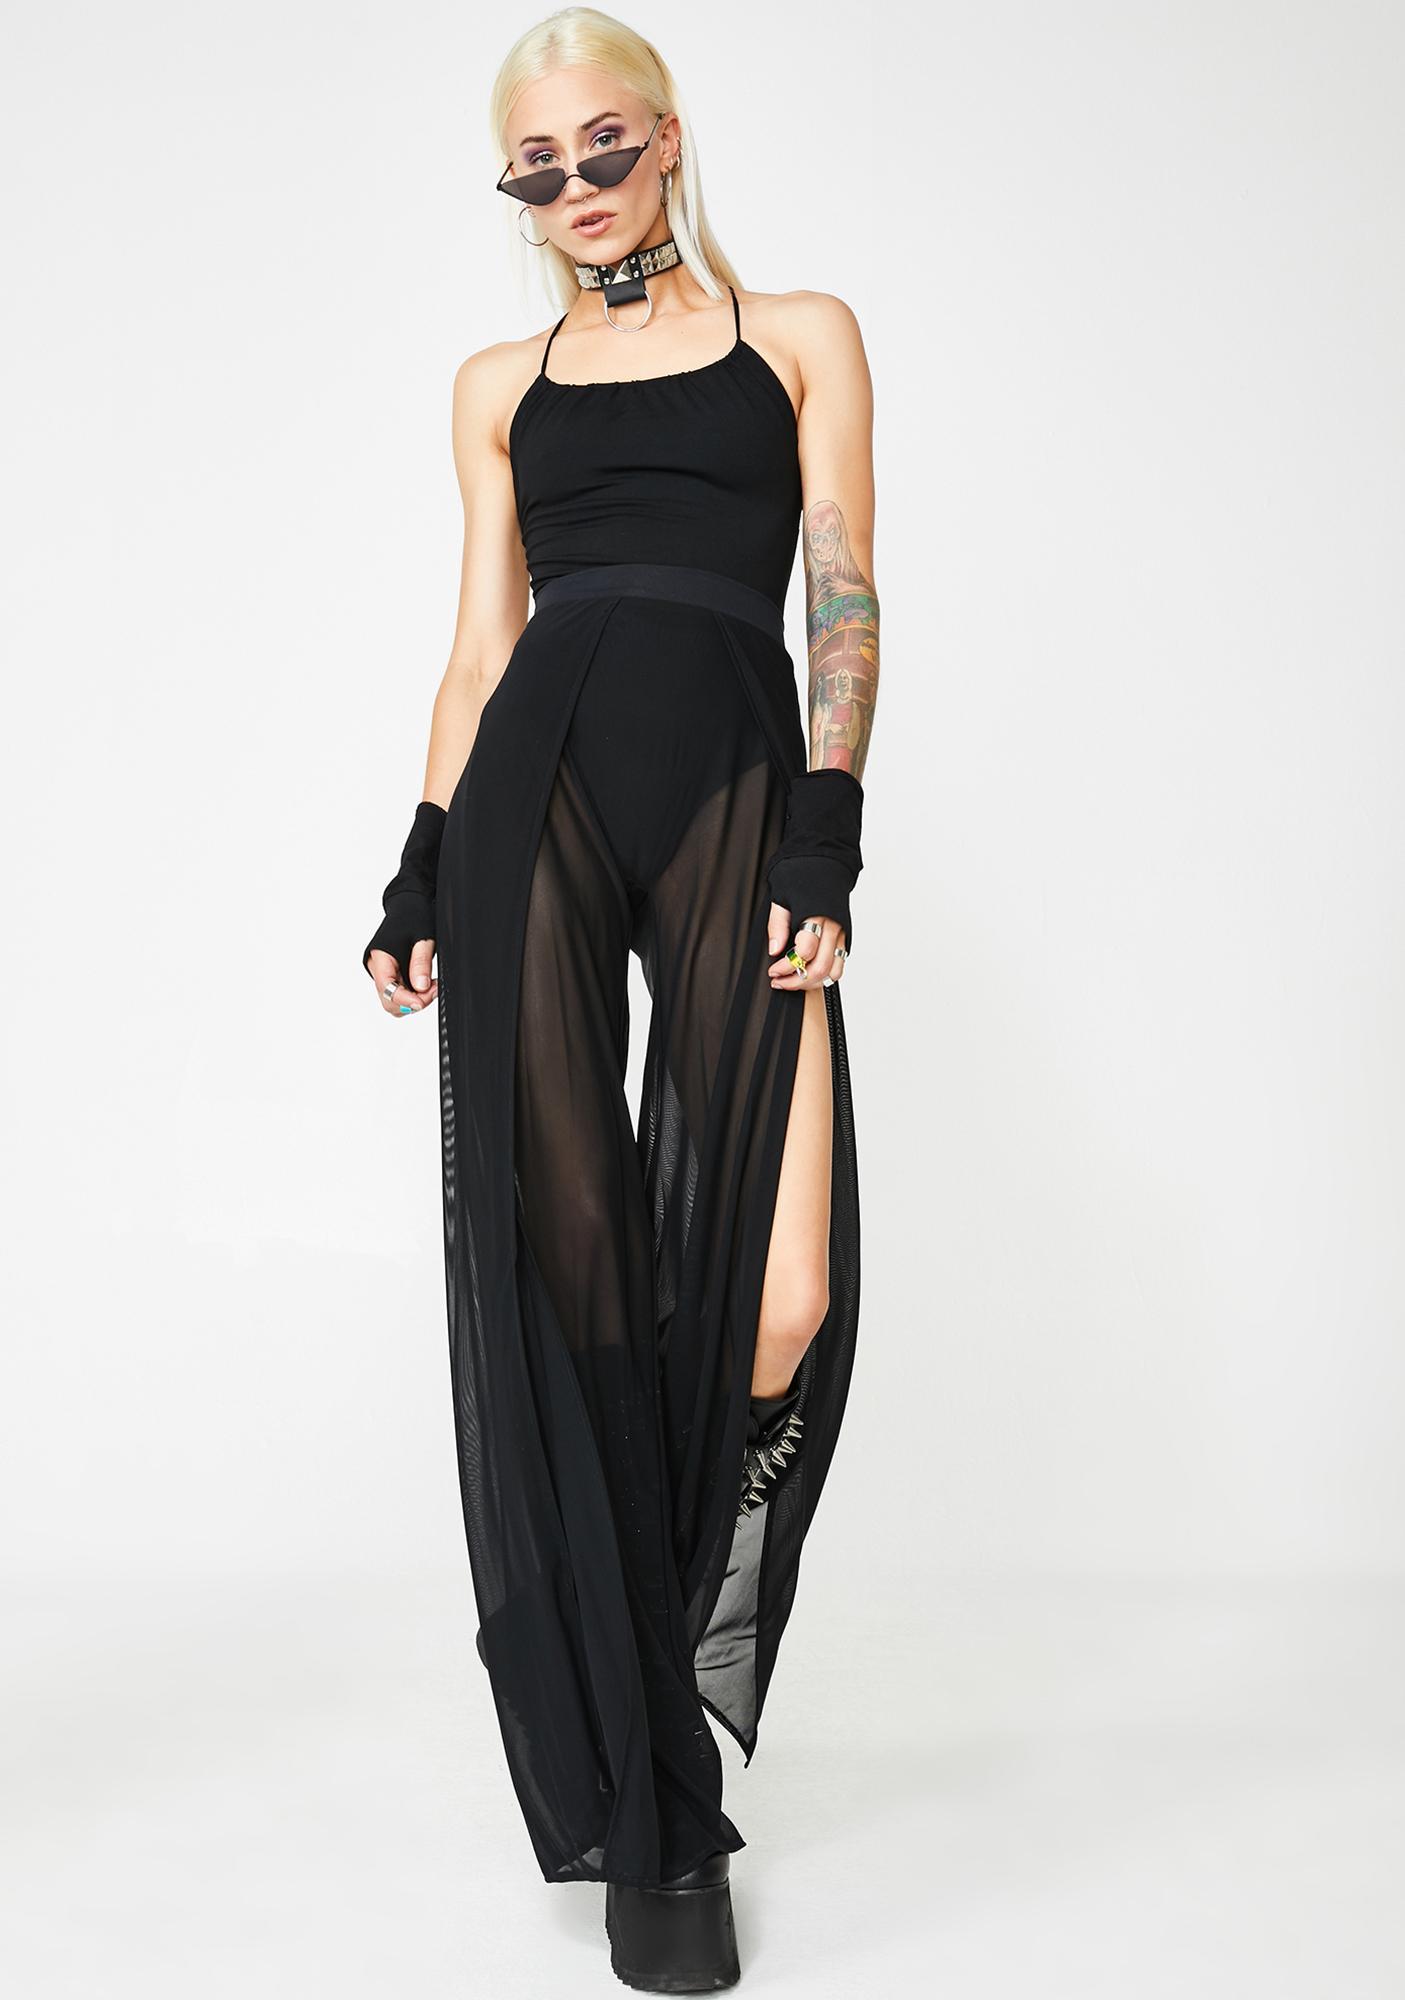 Wicked Straight Sass Strappy Bodysuit